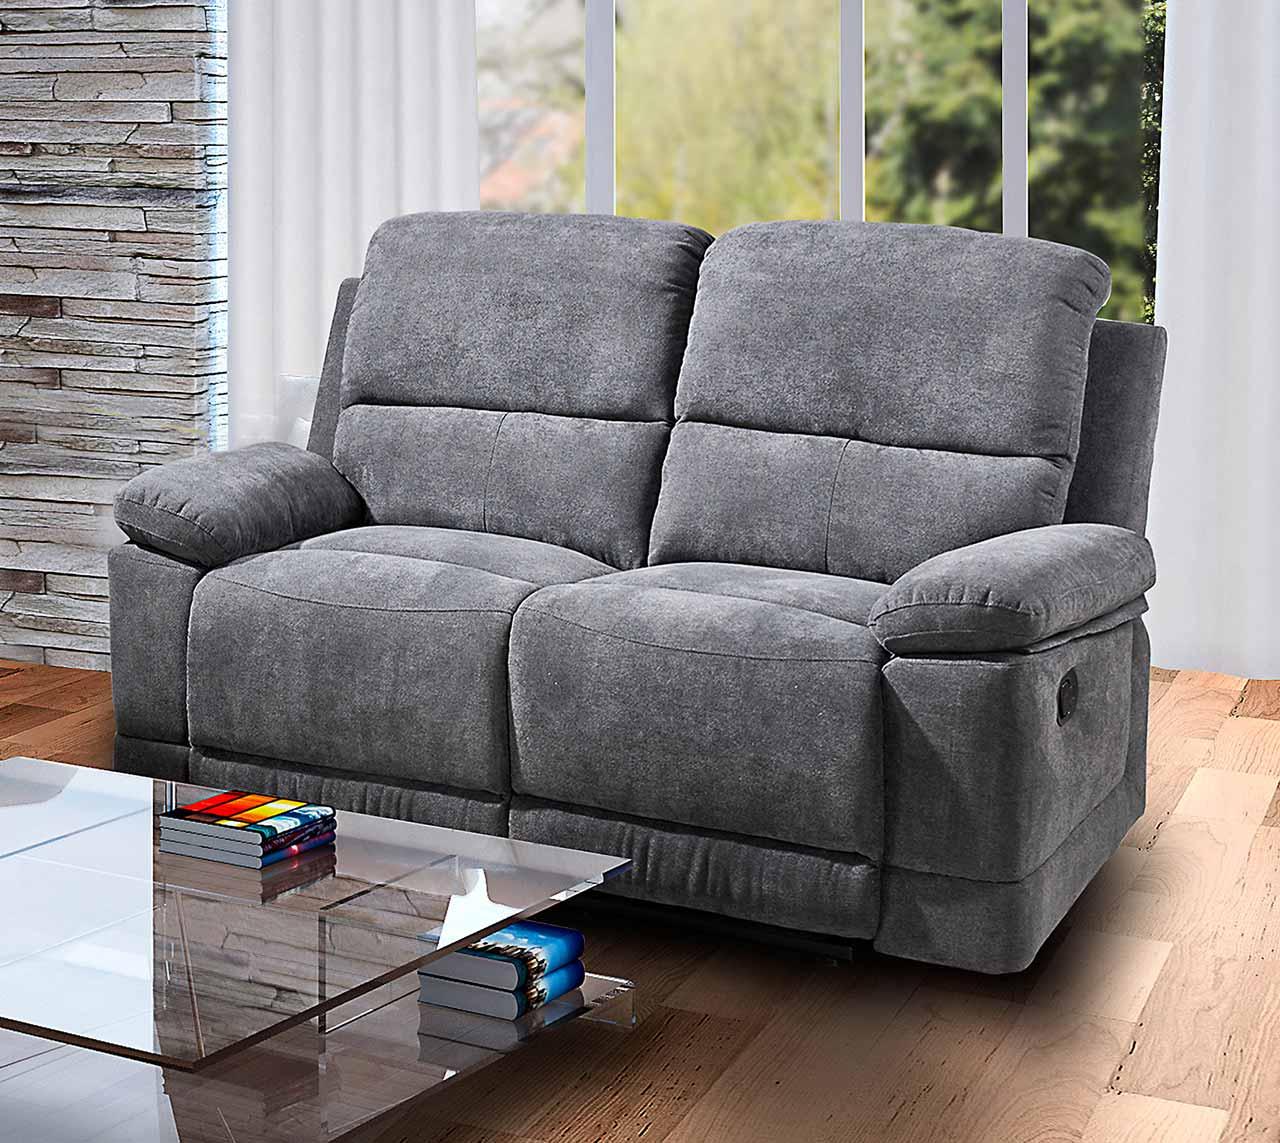 funktionssofa mit relaxfunktion klappsofa relaxsofa 2. Black Bedroom Furniture Sets. Home Design Ideas